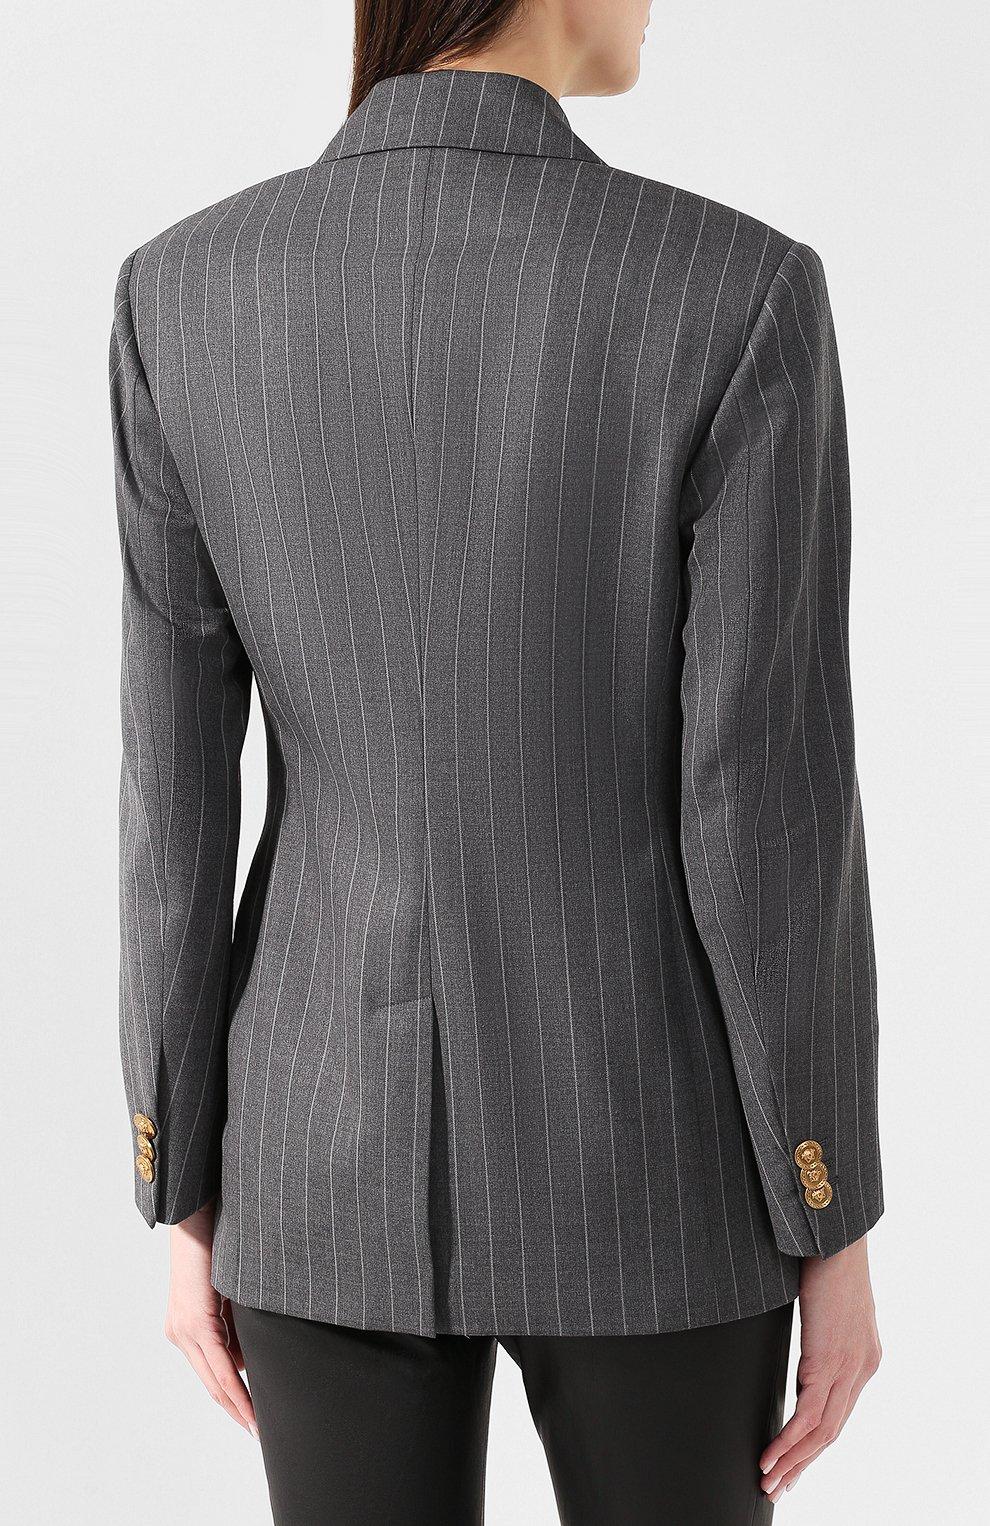 Шерстяной жакет Versace серый   Фото №4